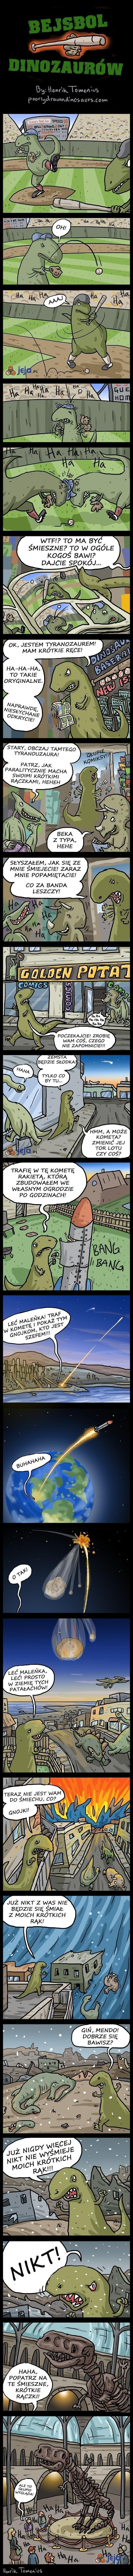 Dinozaur z kompleksami